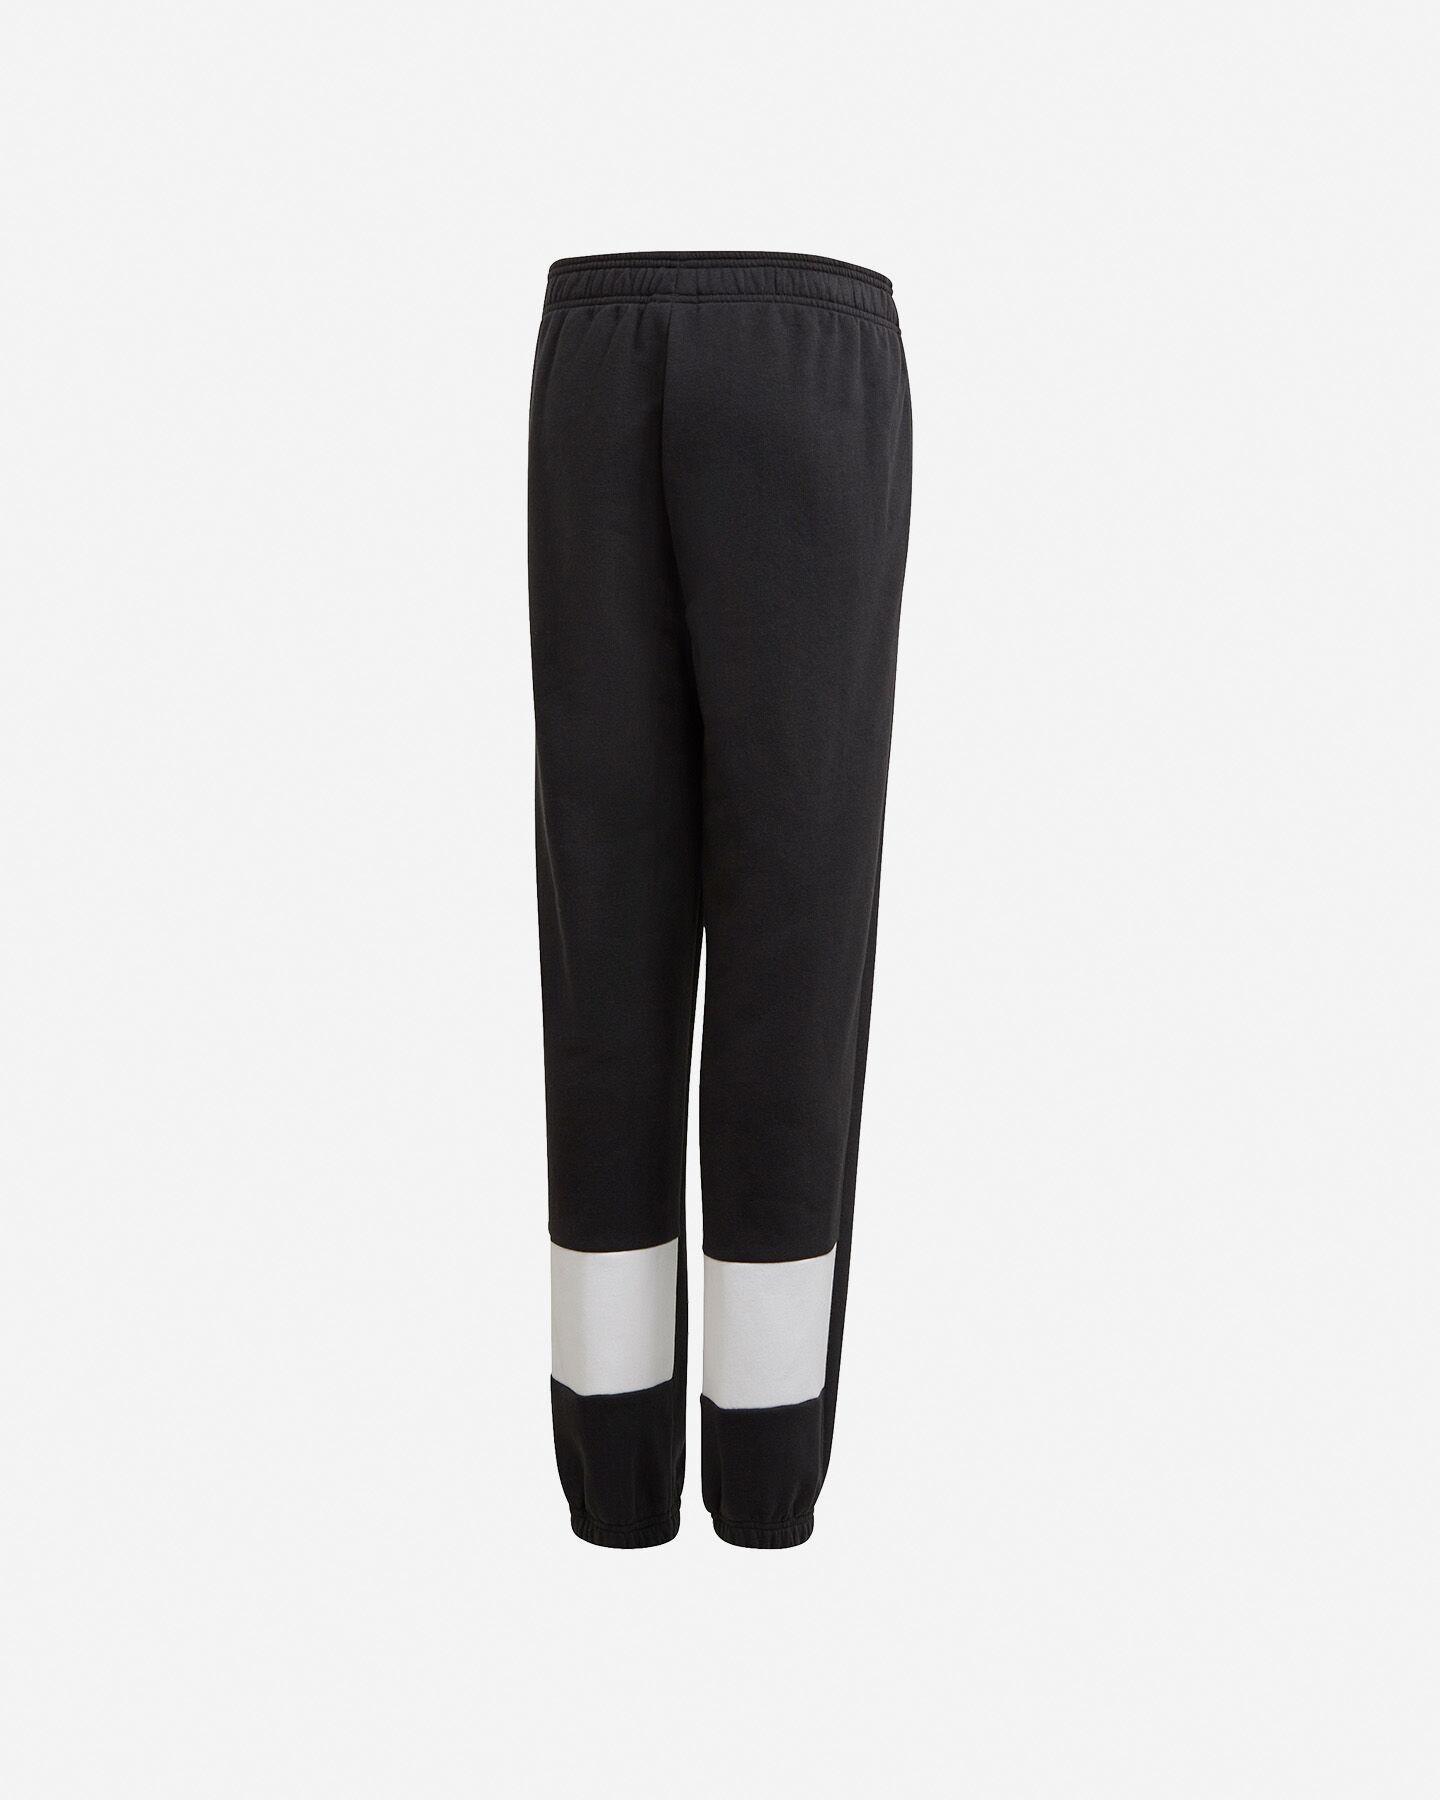 Pantalone ADIDAS FG CDP JR S5230784 scatto 1